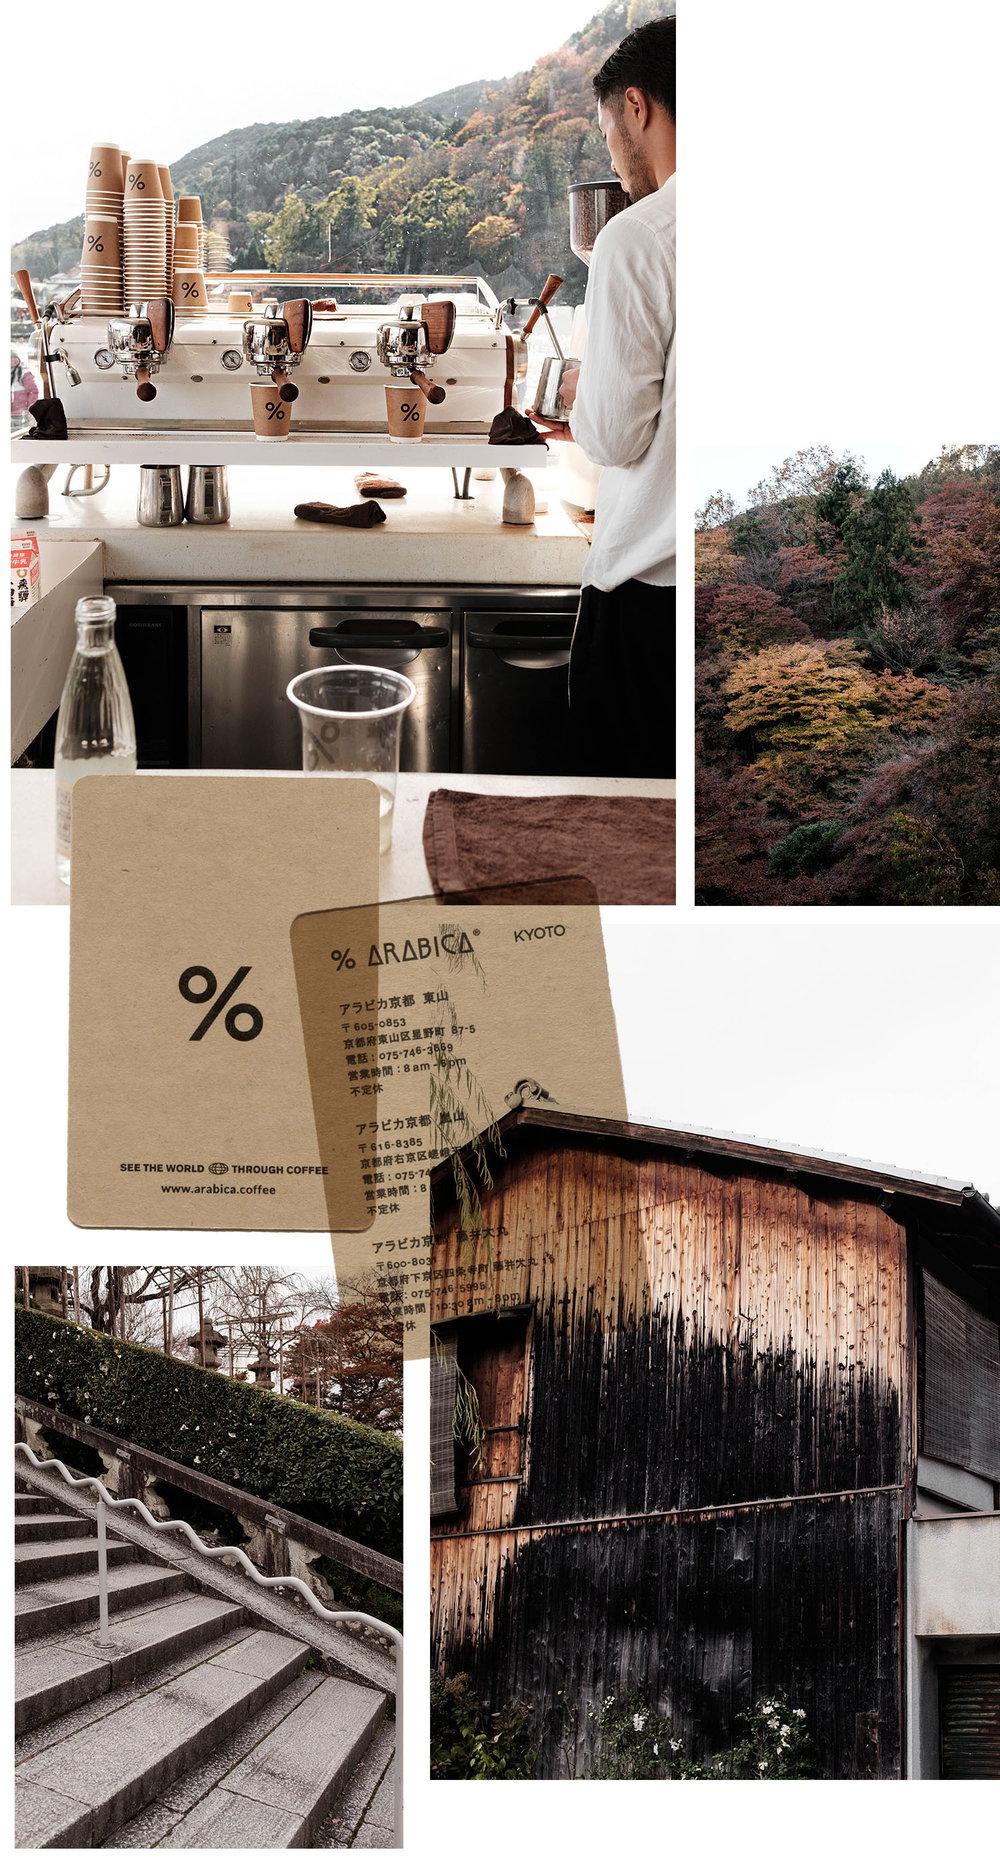 KyotoBlogPost-3.jpg